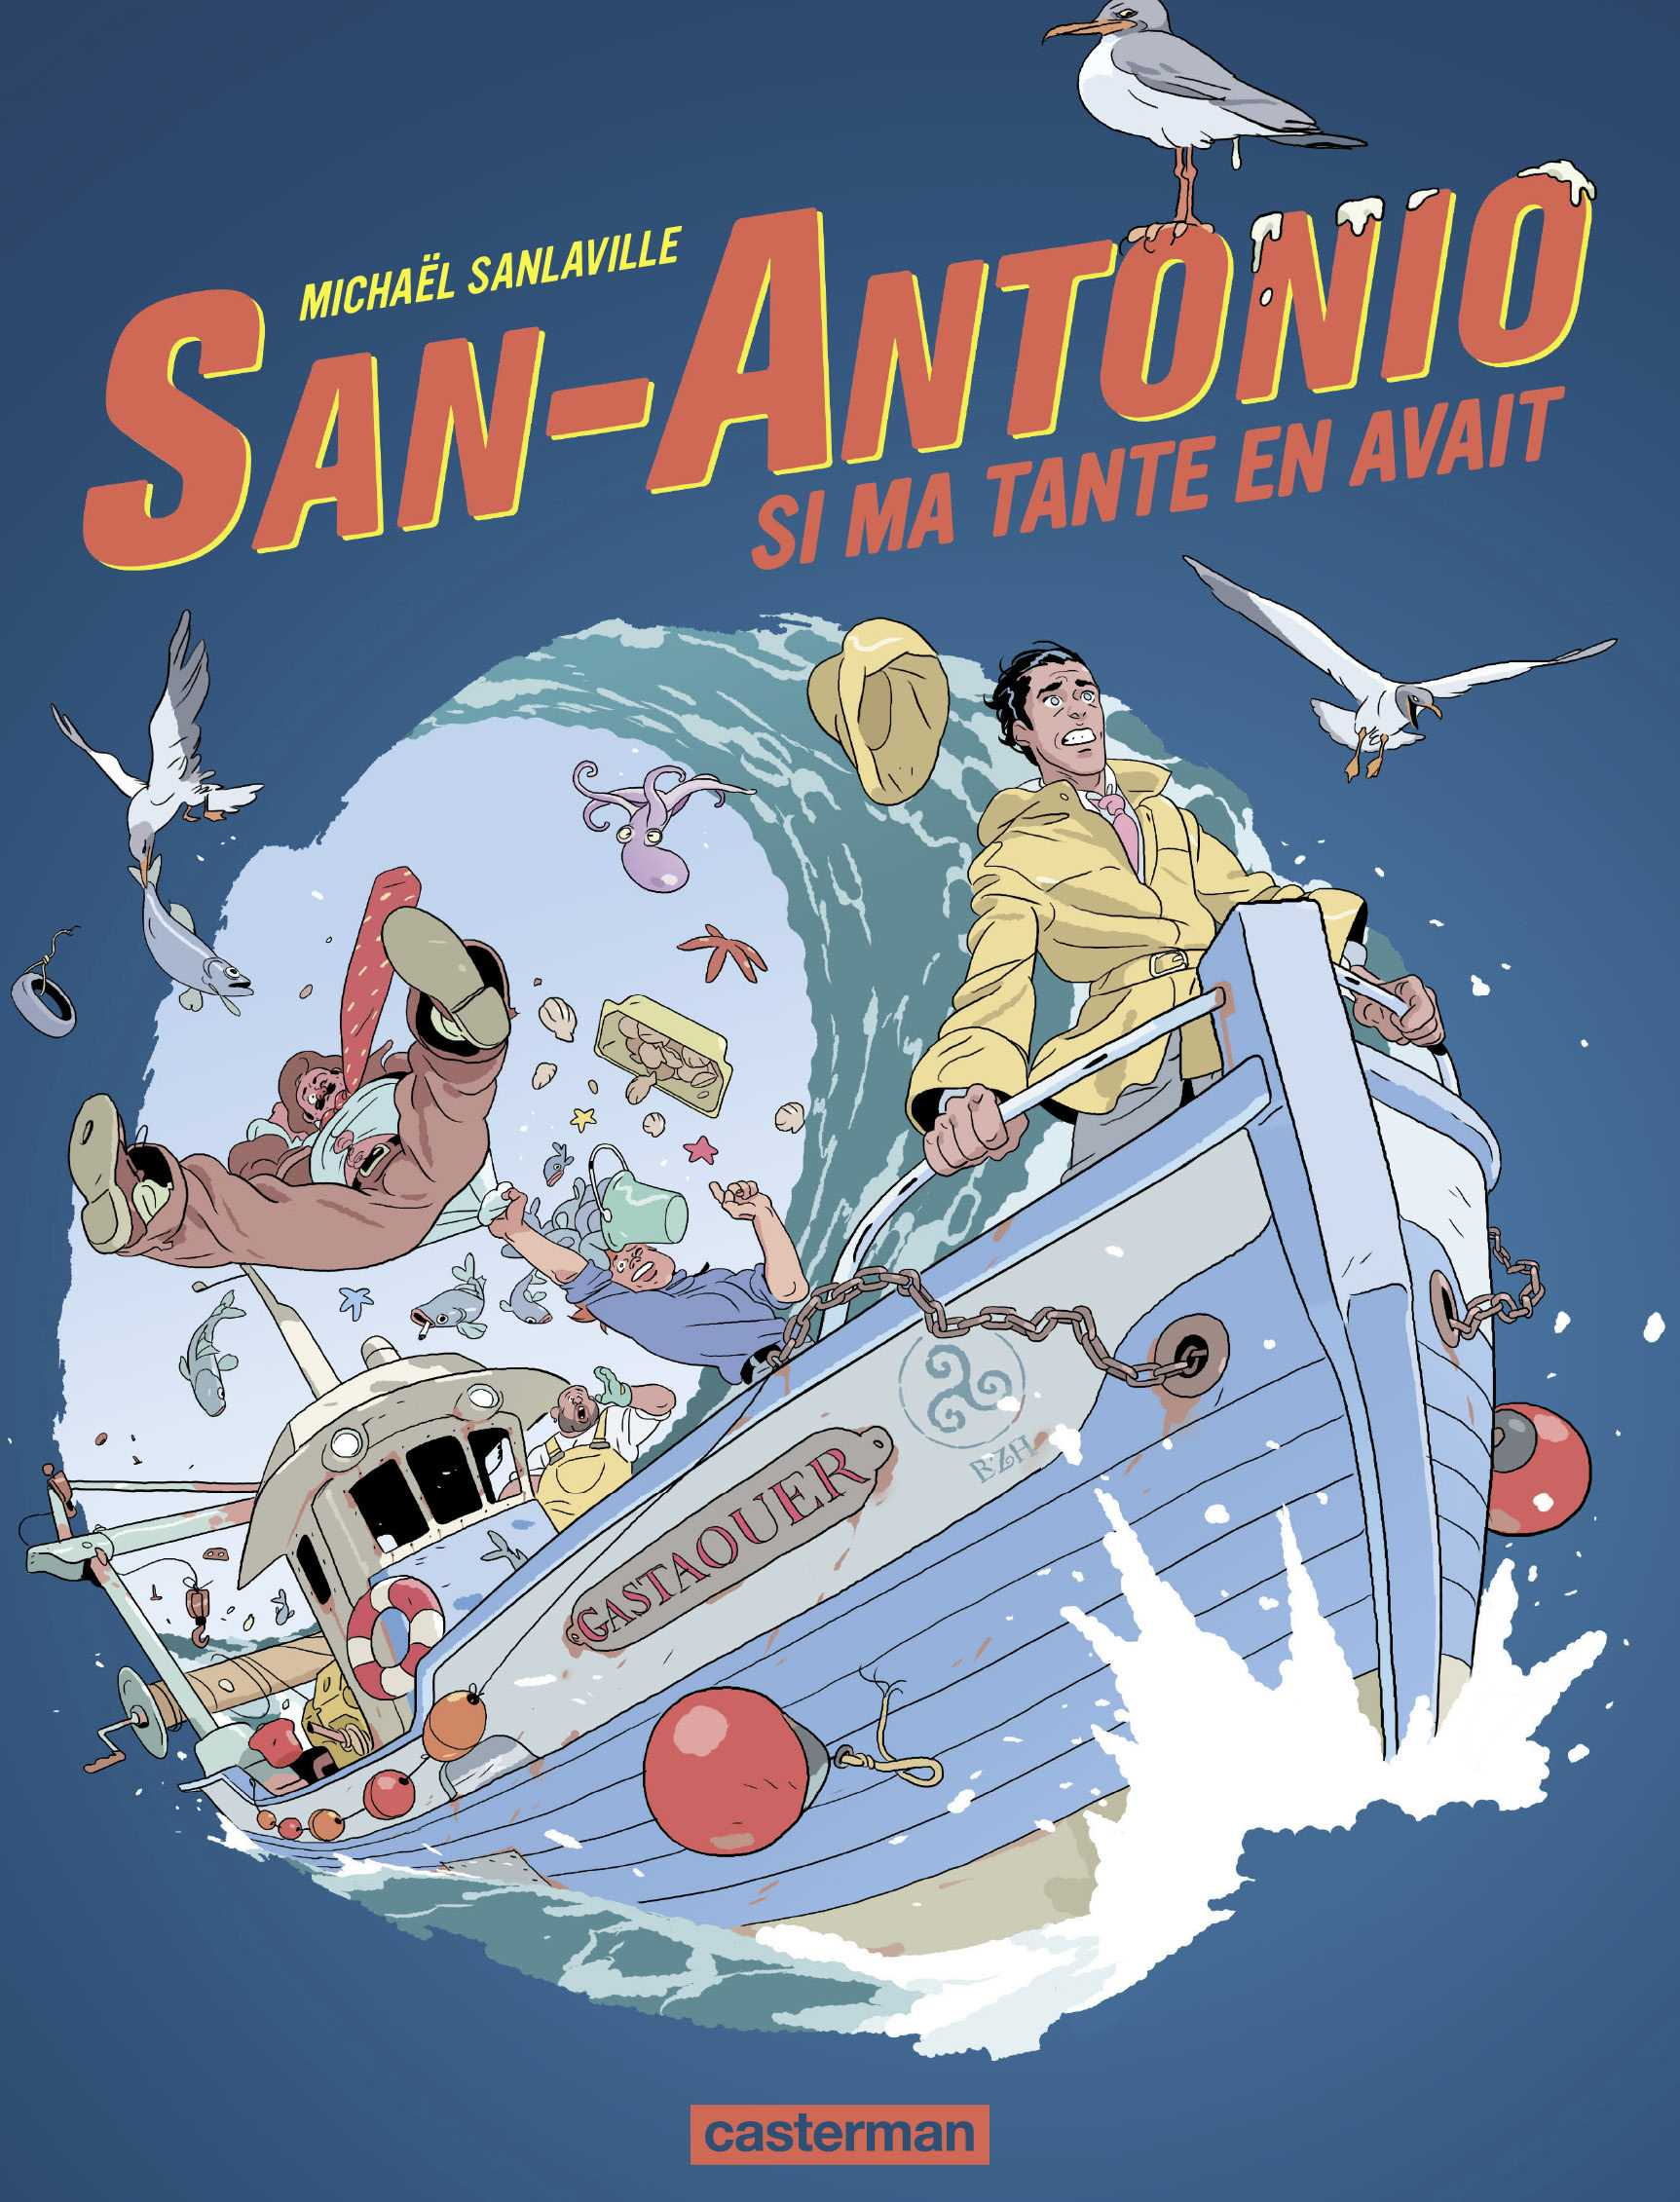 https://www.ligneclaire.info/wp-content/uploads/2020/06/San-Antonio.jpg